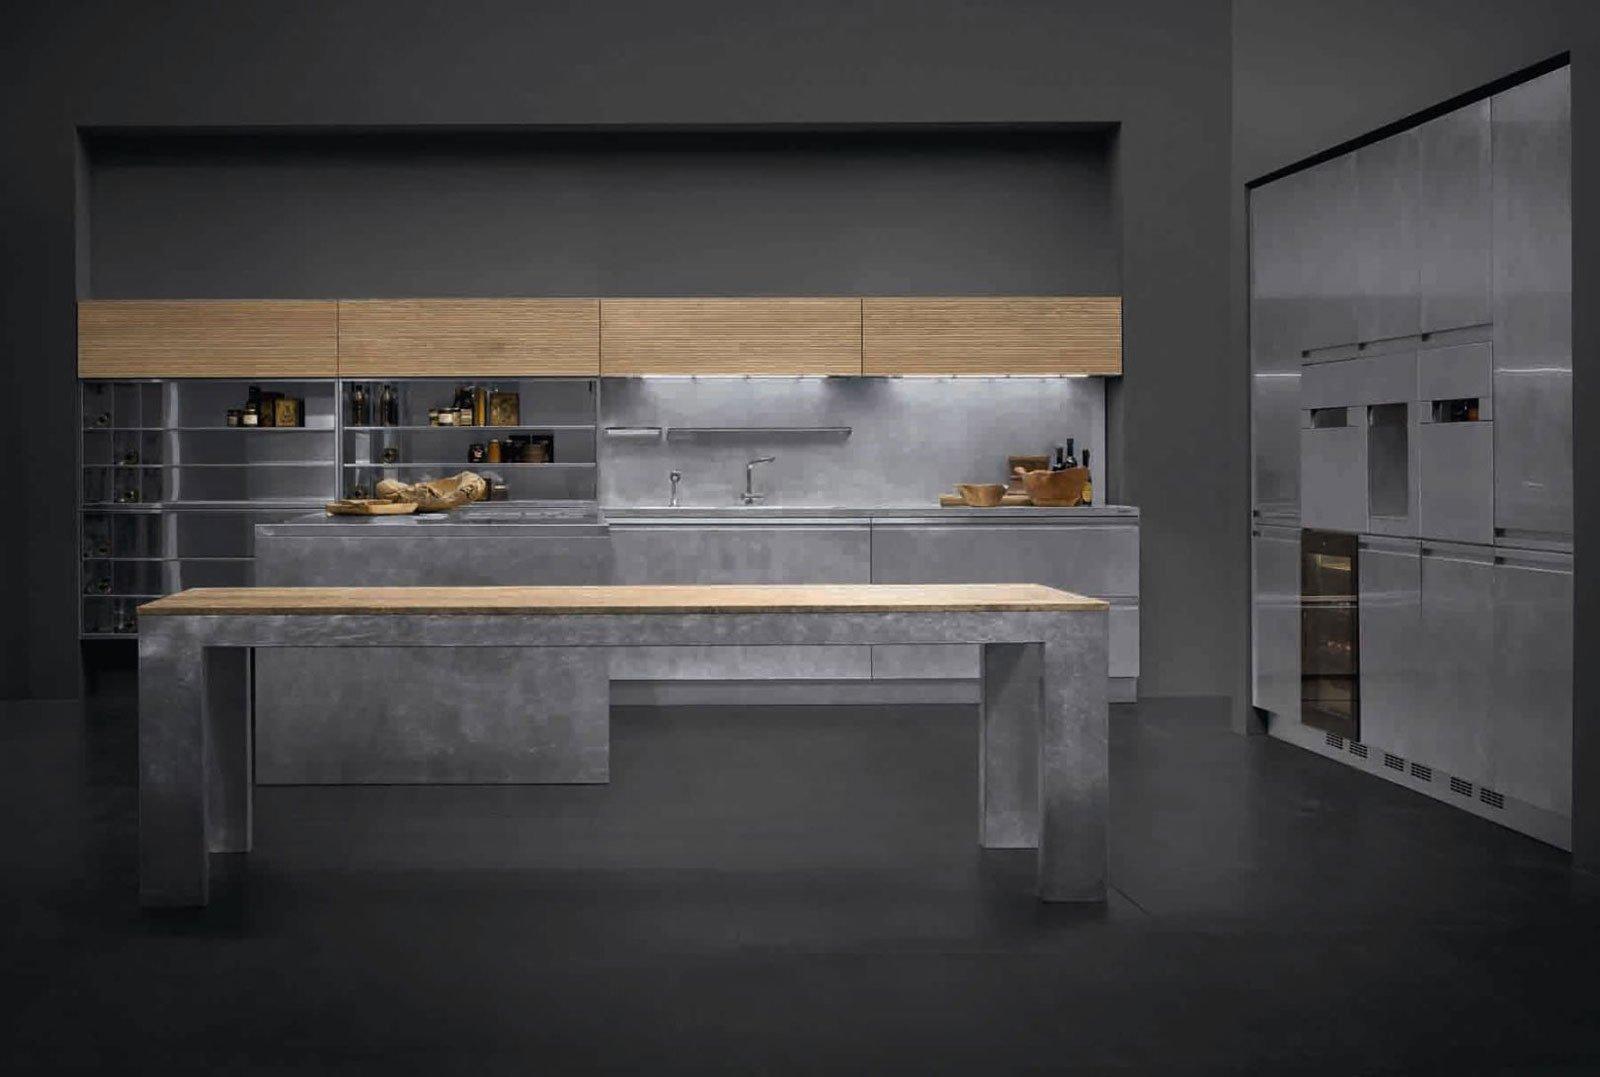 Cucine in grigio di inaspettata freschezza novit Eurocucina in anteprima  Cose di Casa